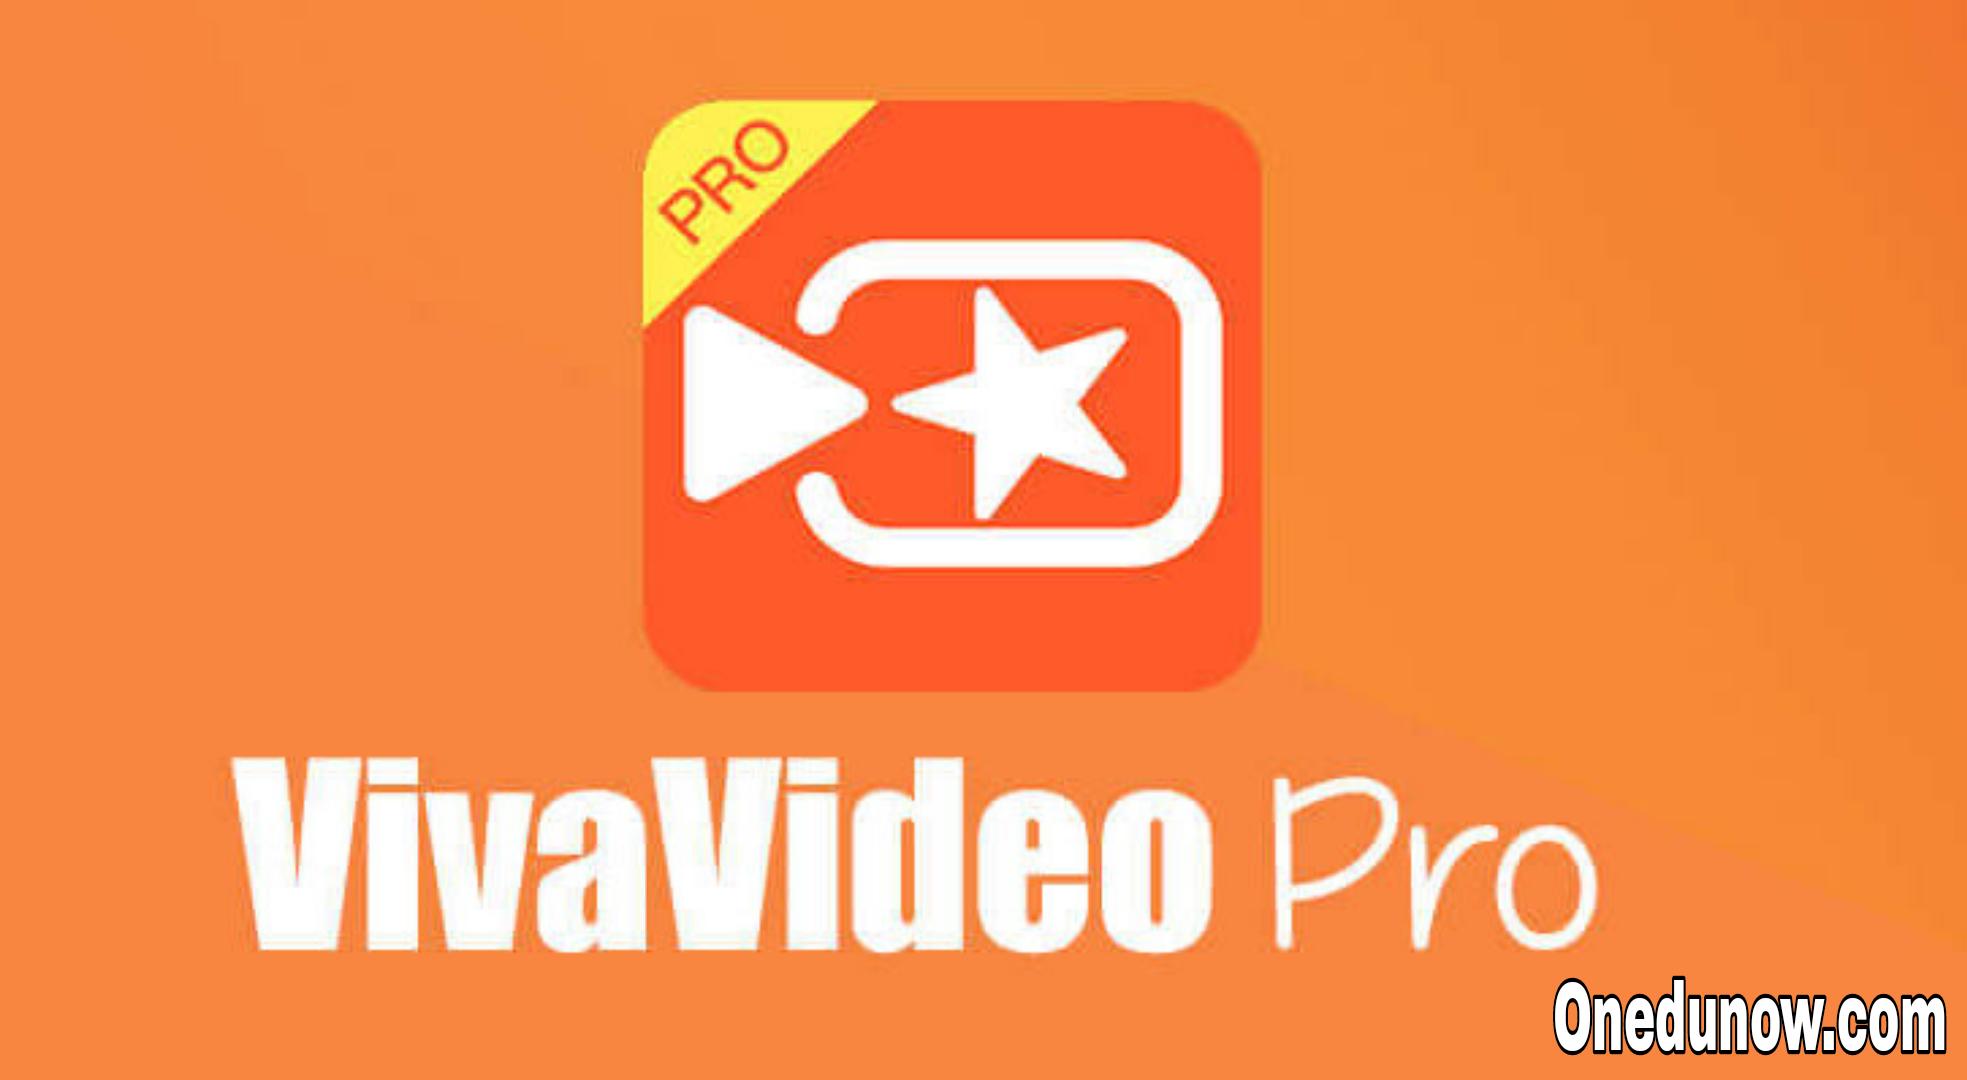 VivaVideo Pro APK v8.11.5 (Premium/VIP Unlocked) 2021